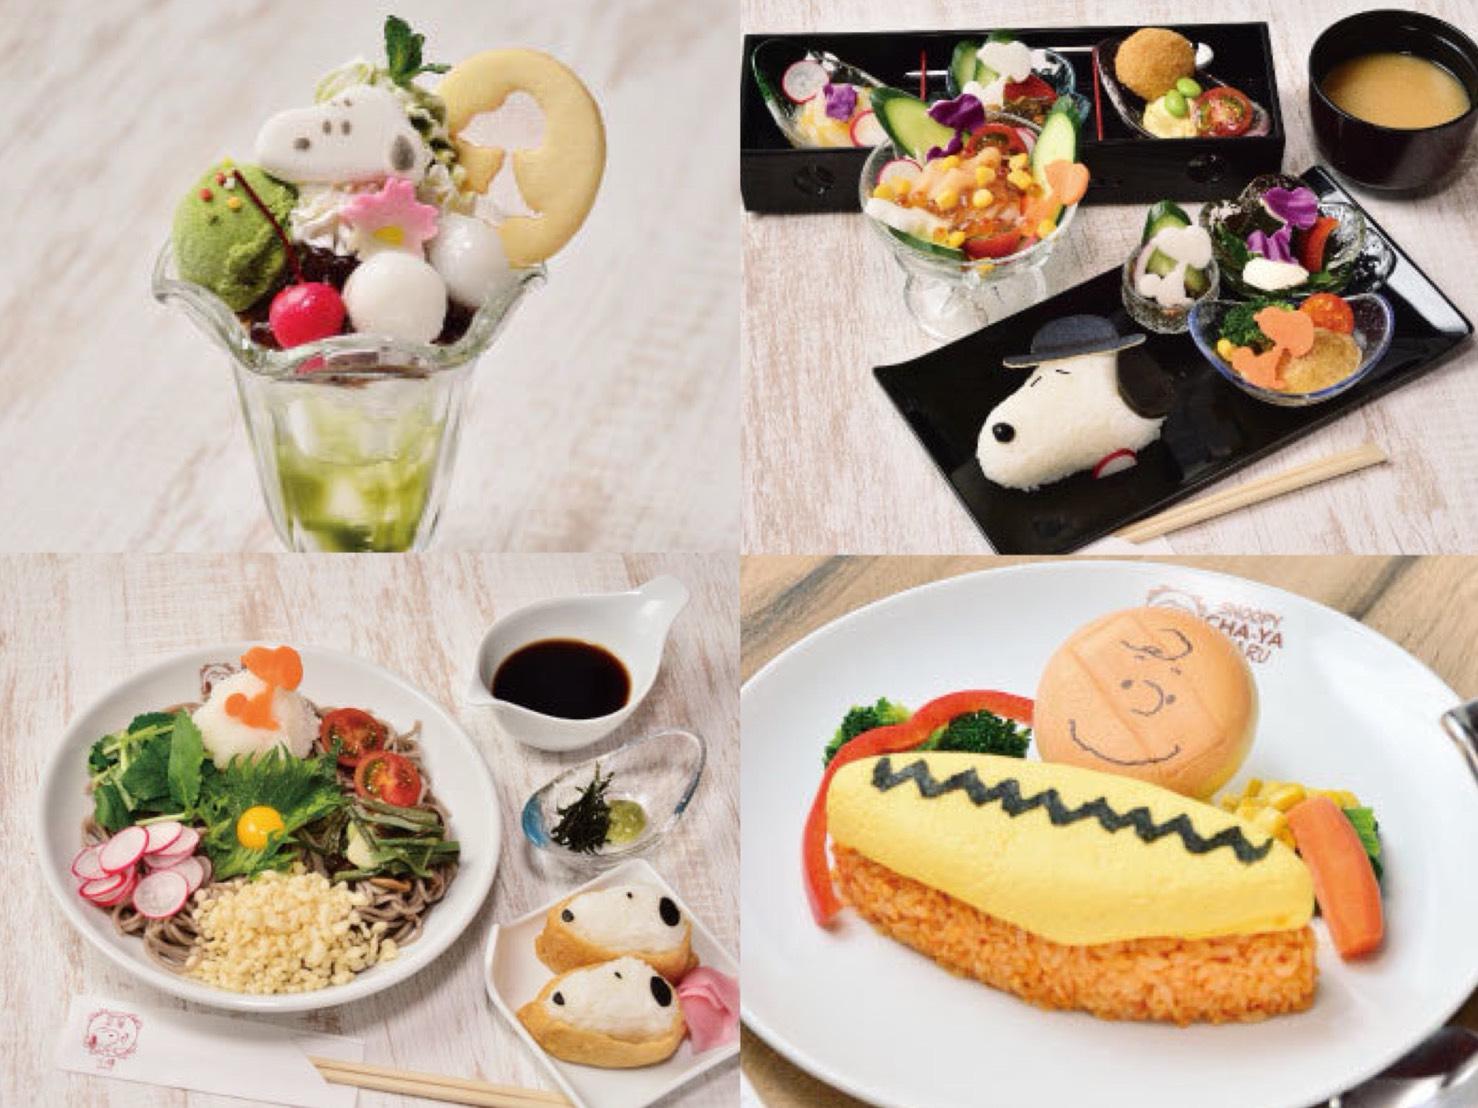 PEANUTS咖啡廳「SNOOPY茶屋」將於北海道・小樽開幕 北海道、咖啡廳、